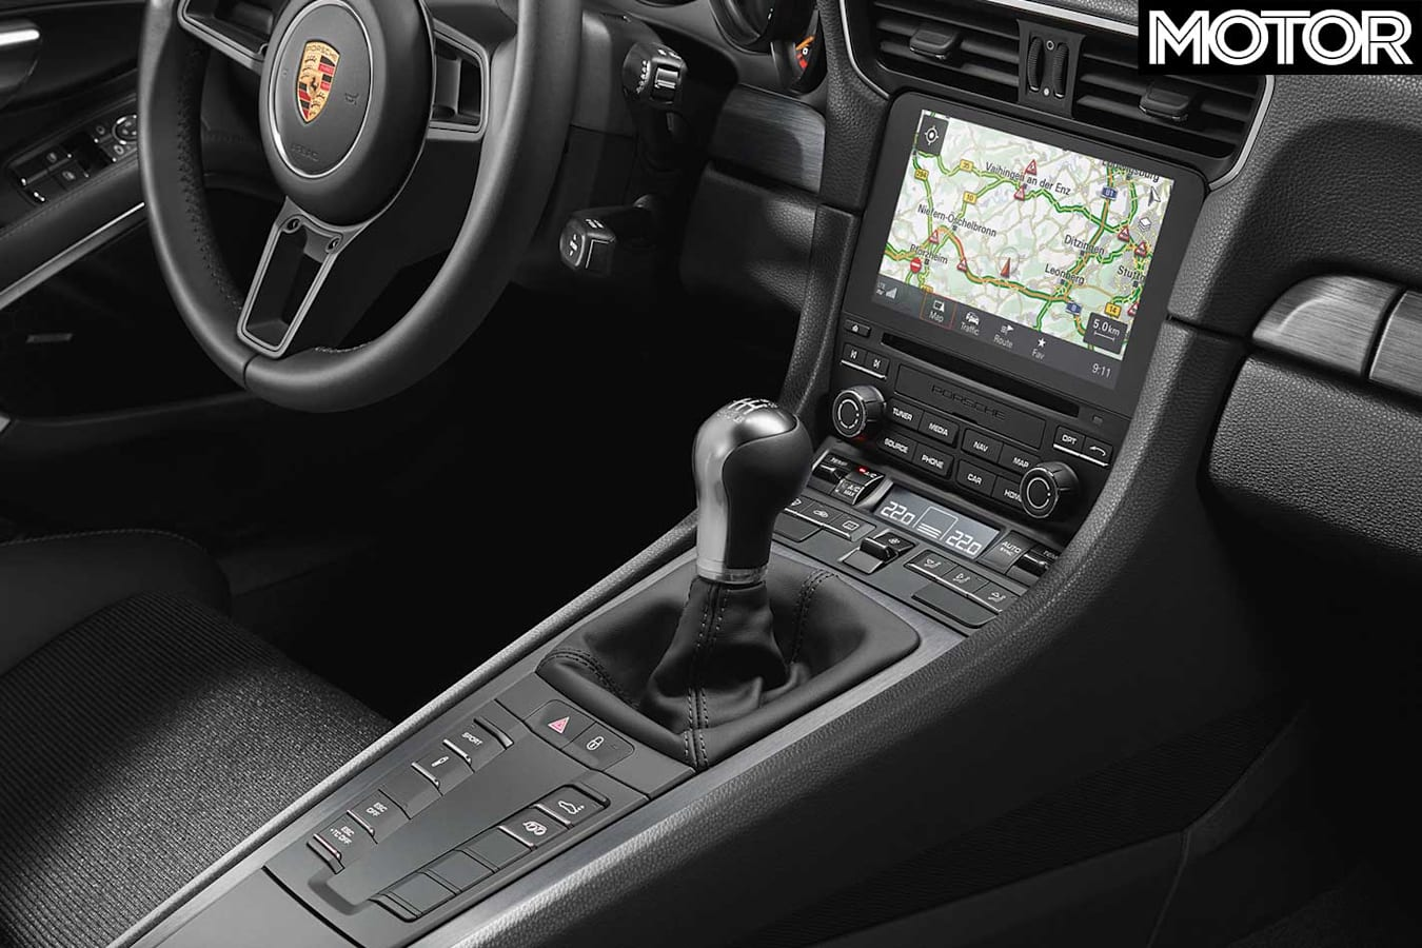 Porsche Investigating 9500 Rpm Street Legal 911 Touring Manual Jpg